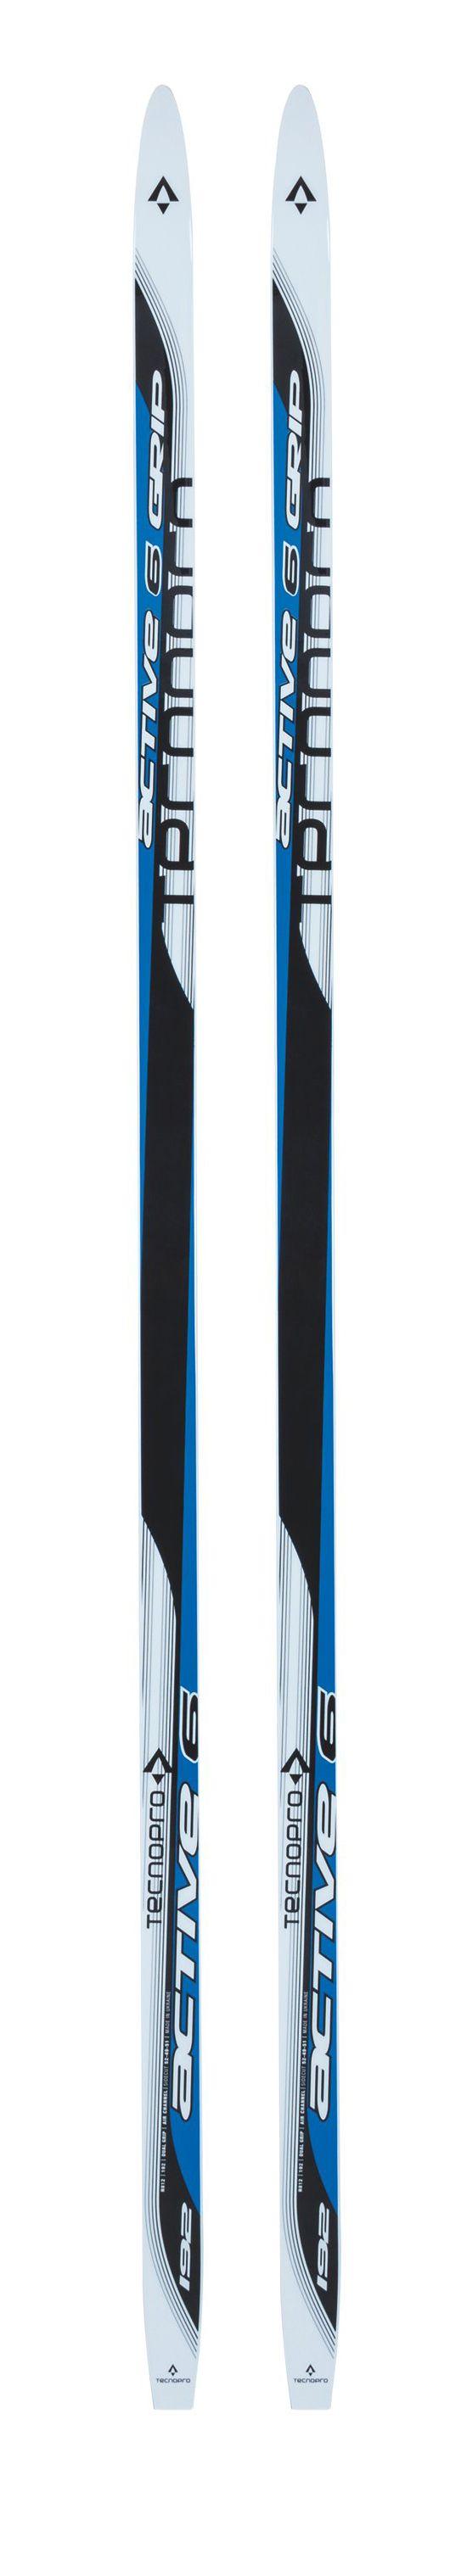 Active 6 Classic NIS Turski WHITE/BLUE/BLK